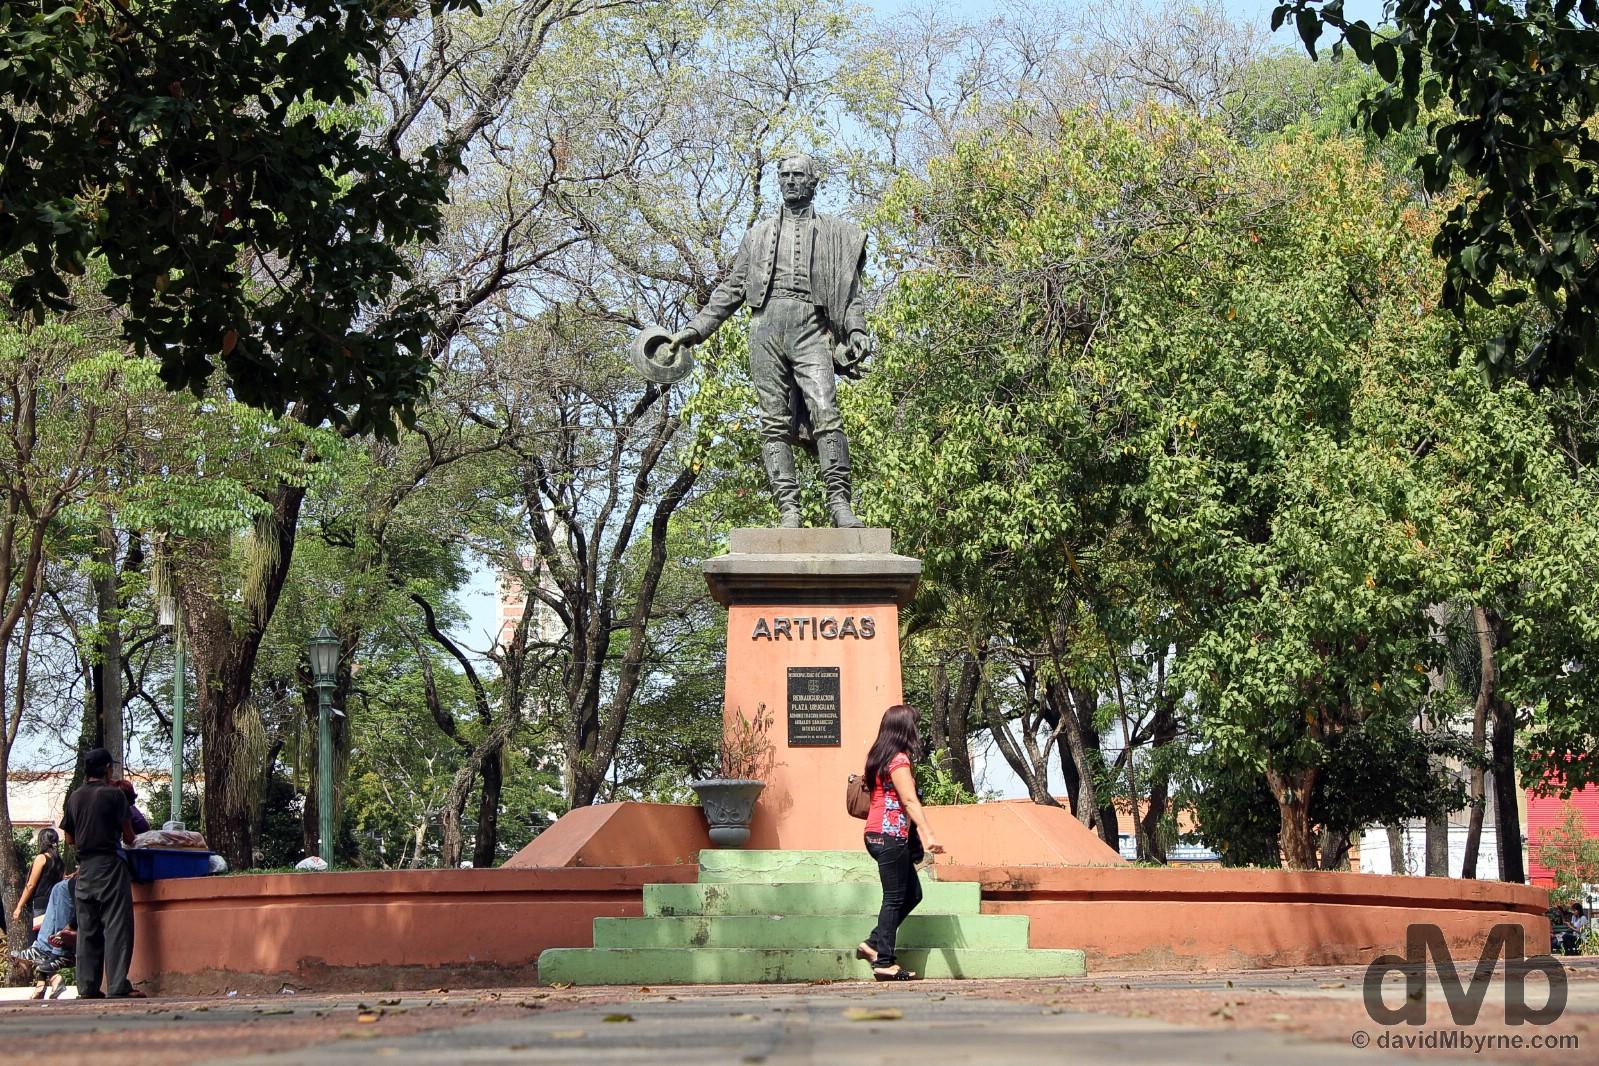 The Artigas statue Plaza Uruguaya, Asuncion, Paraguay. September 9, 2015.